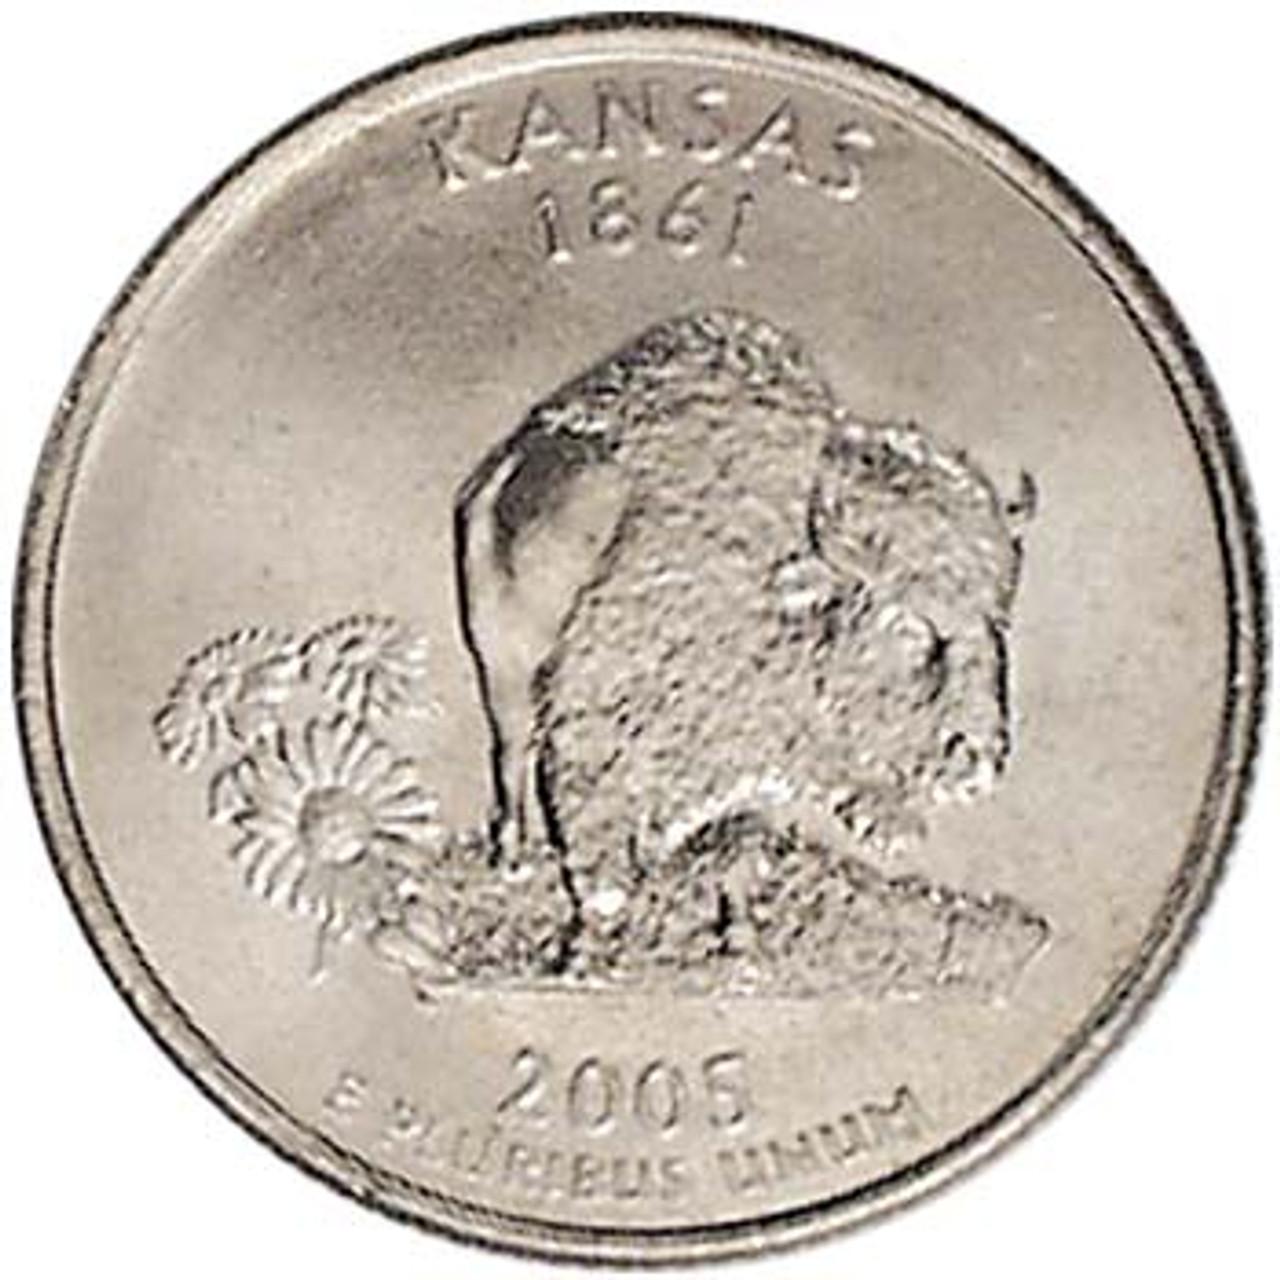 2005-D Kansas Quarter Brilliant Uncirculated Image 1